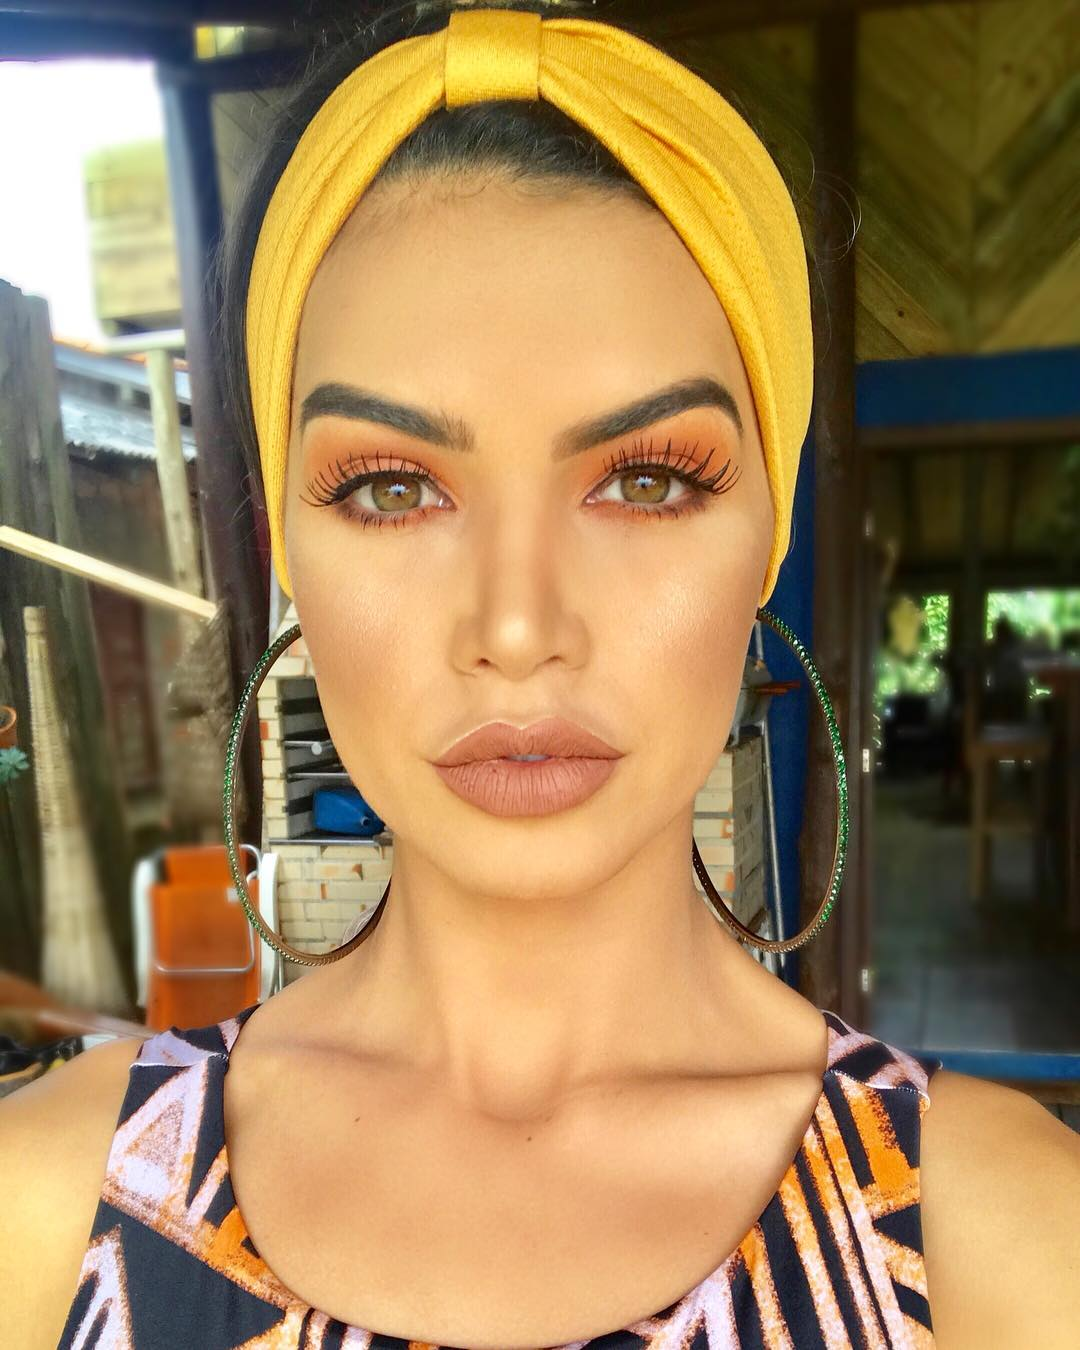 fernanda recht, miss brasil internacional 2018. Ld4r7f10